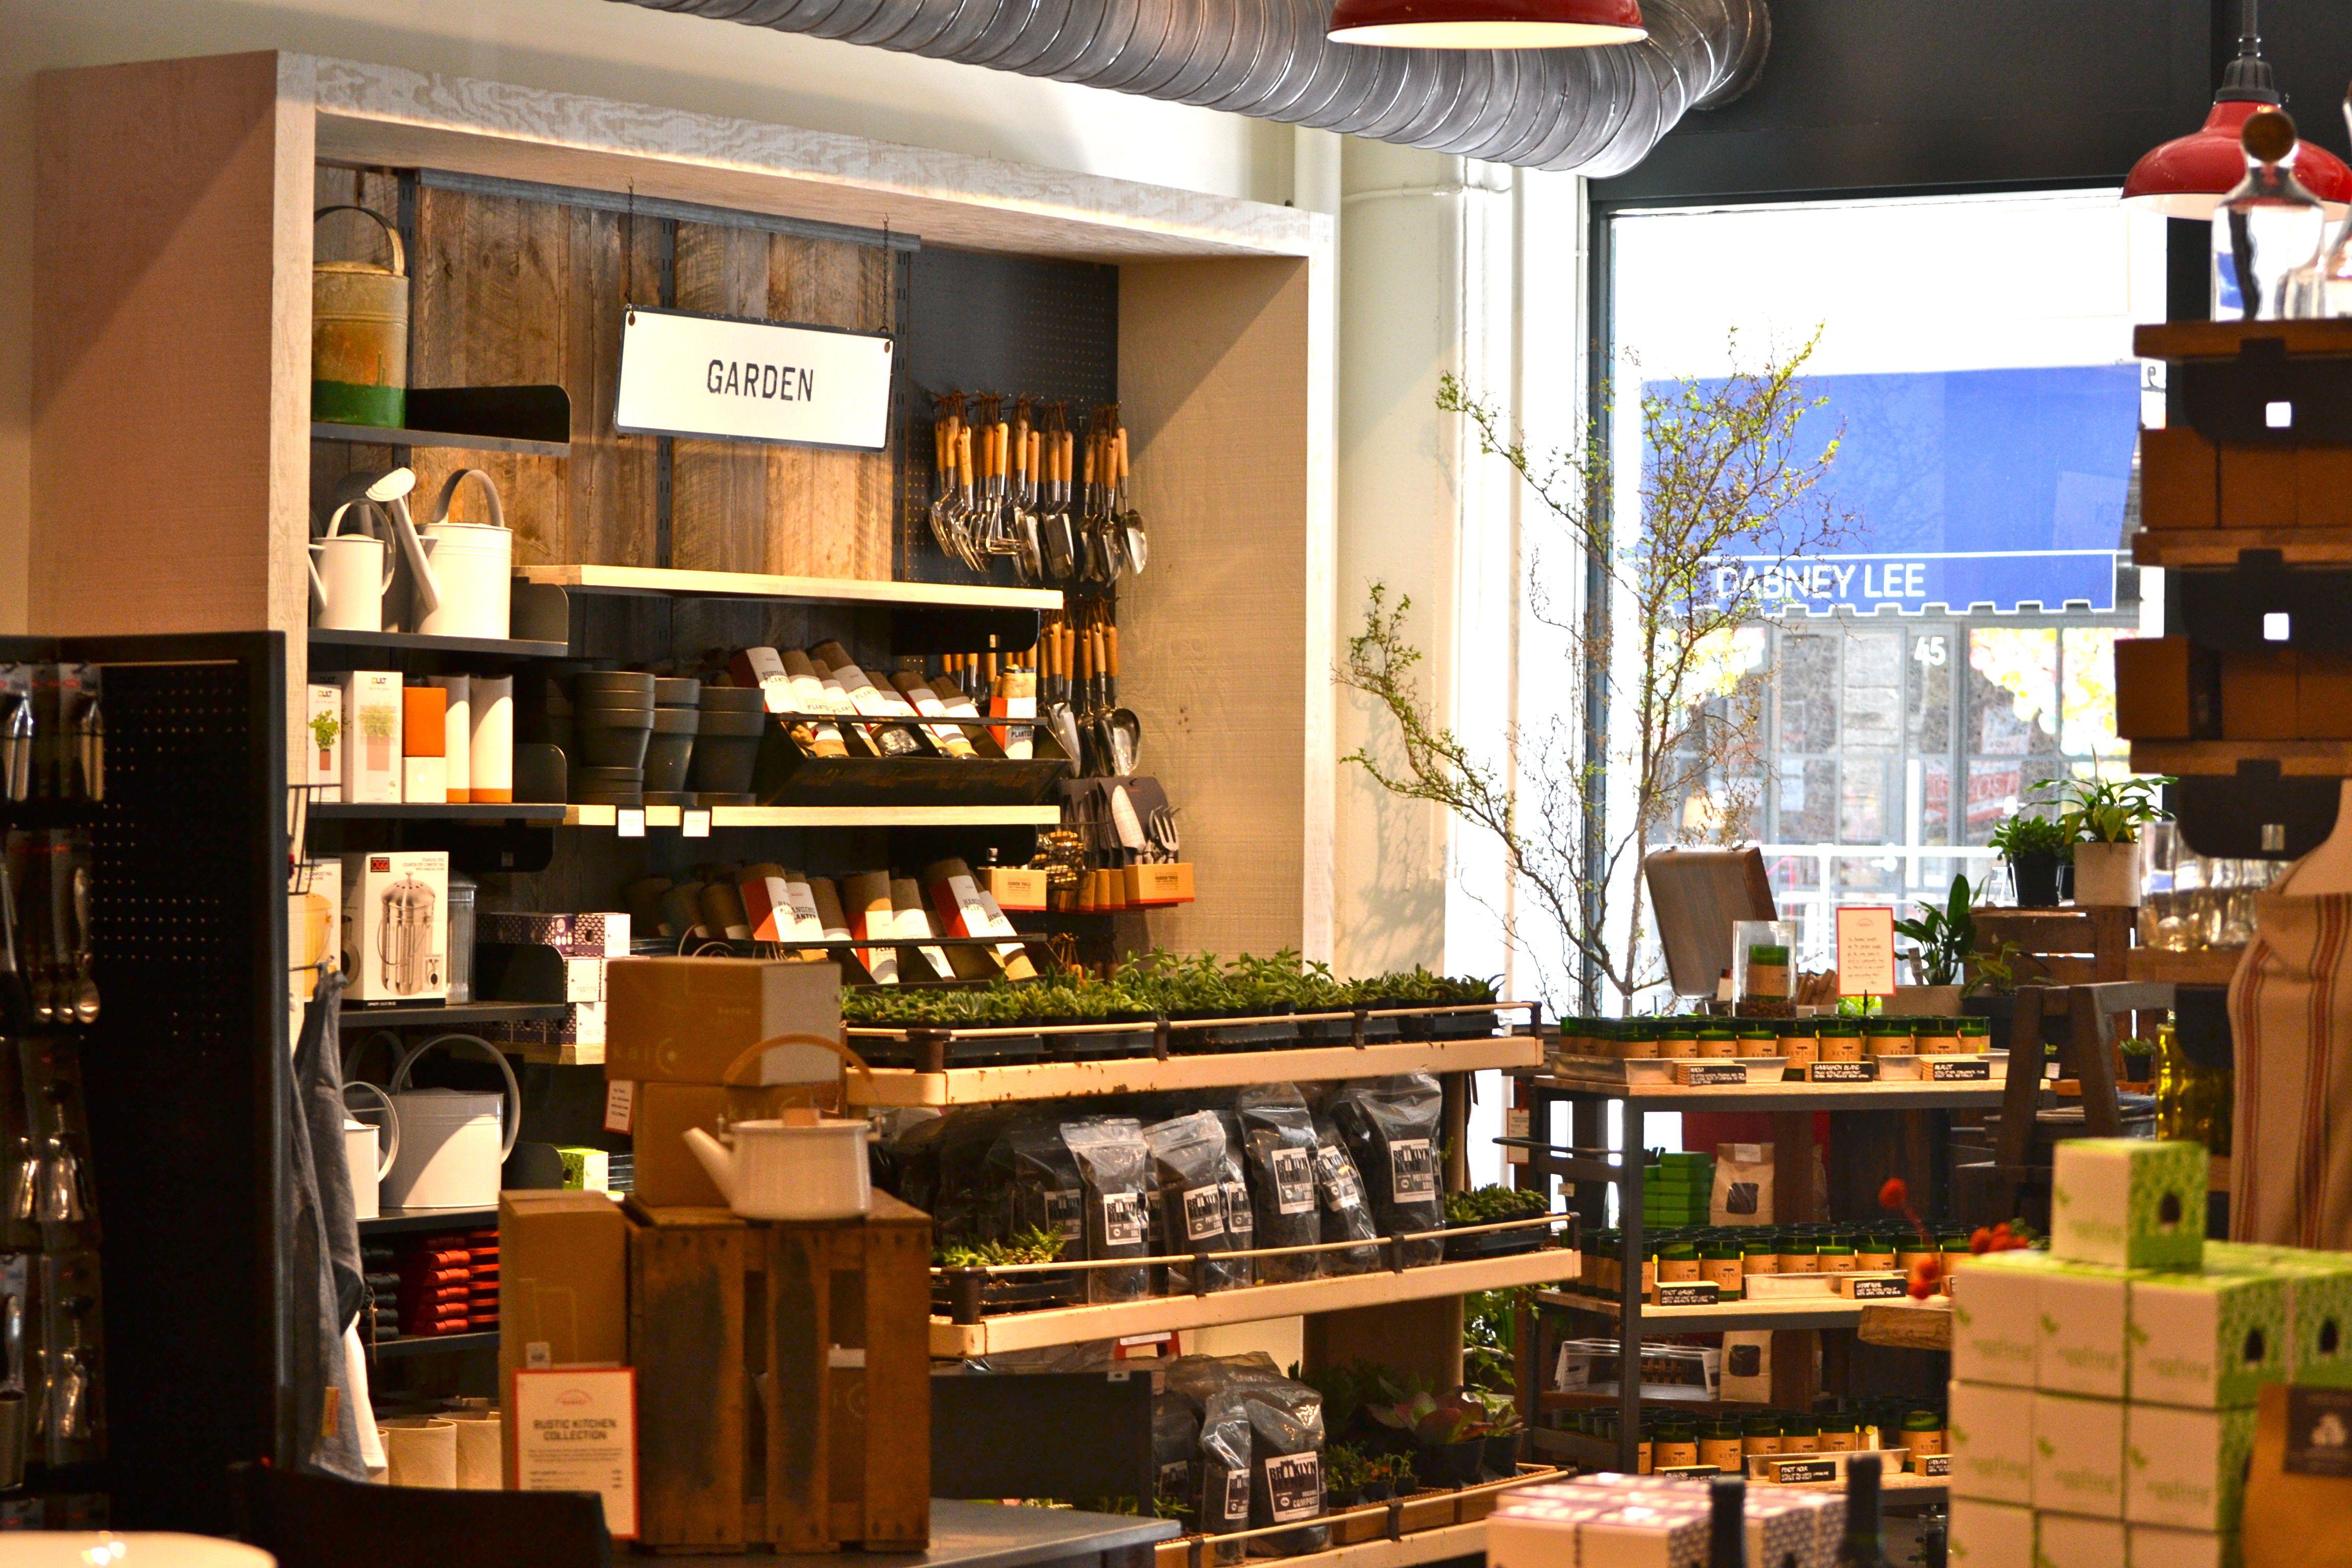 west elm retail stores google search - West Elm Store